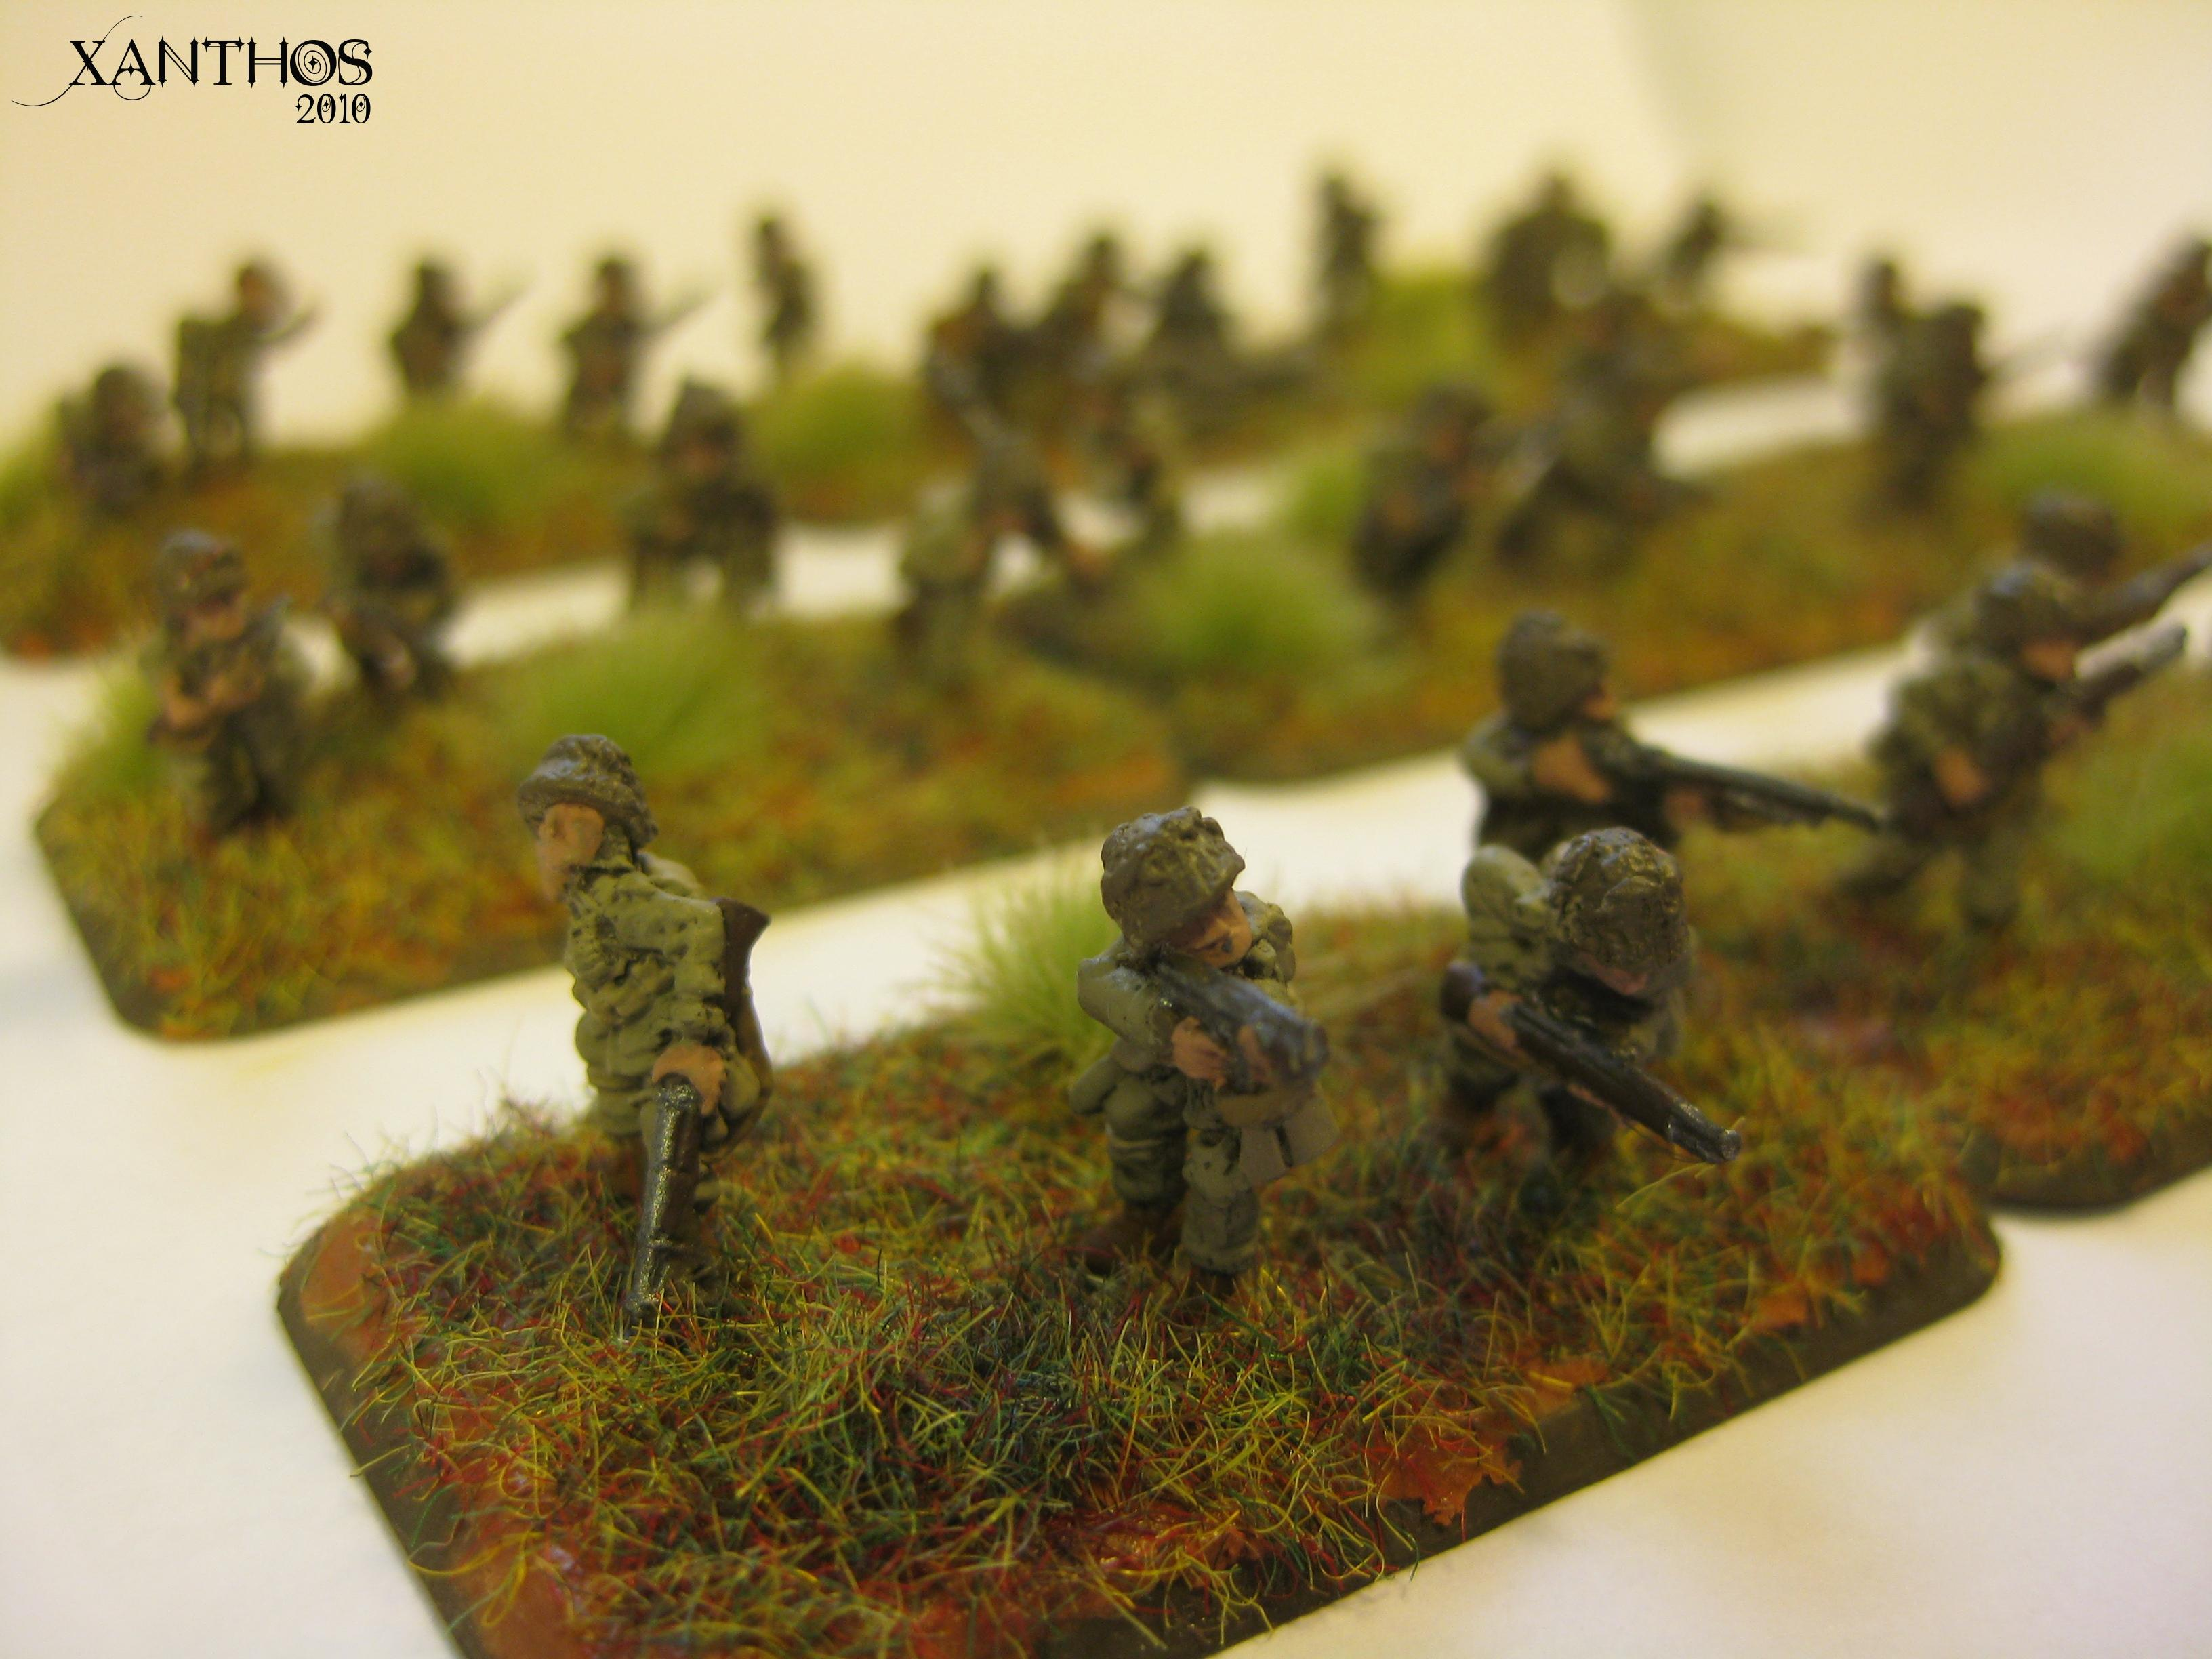 101st, Airborne, America, Flames Of War, World War 2